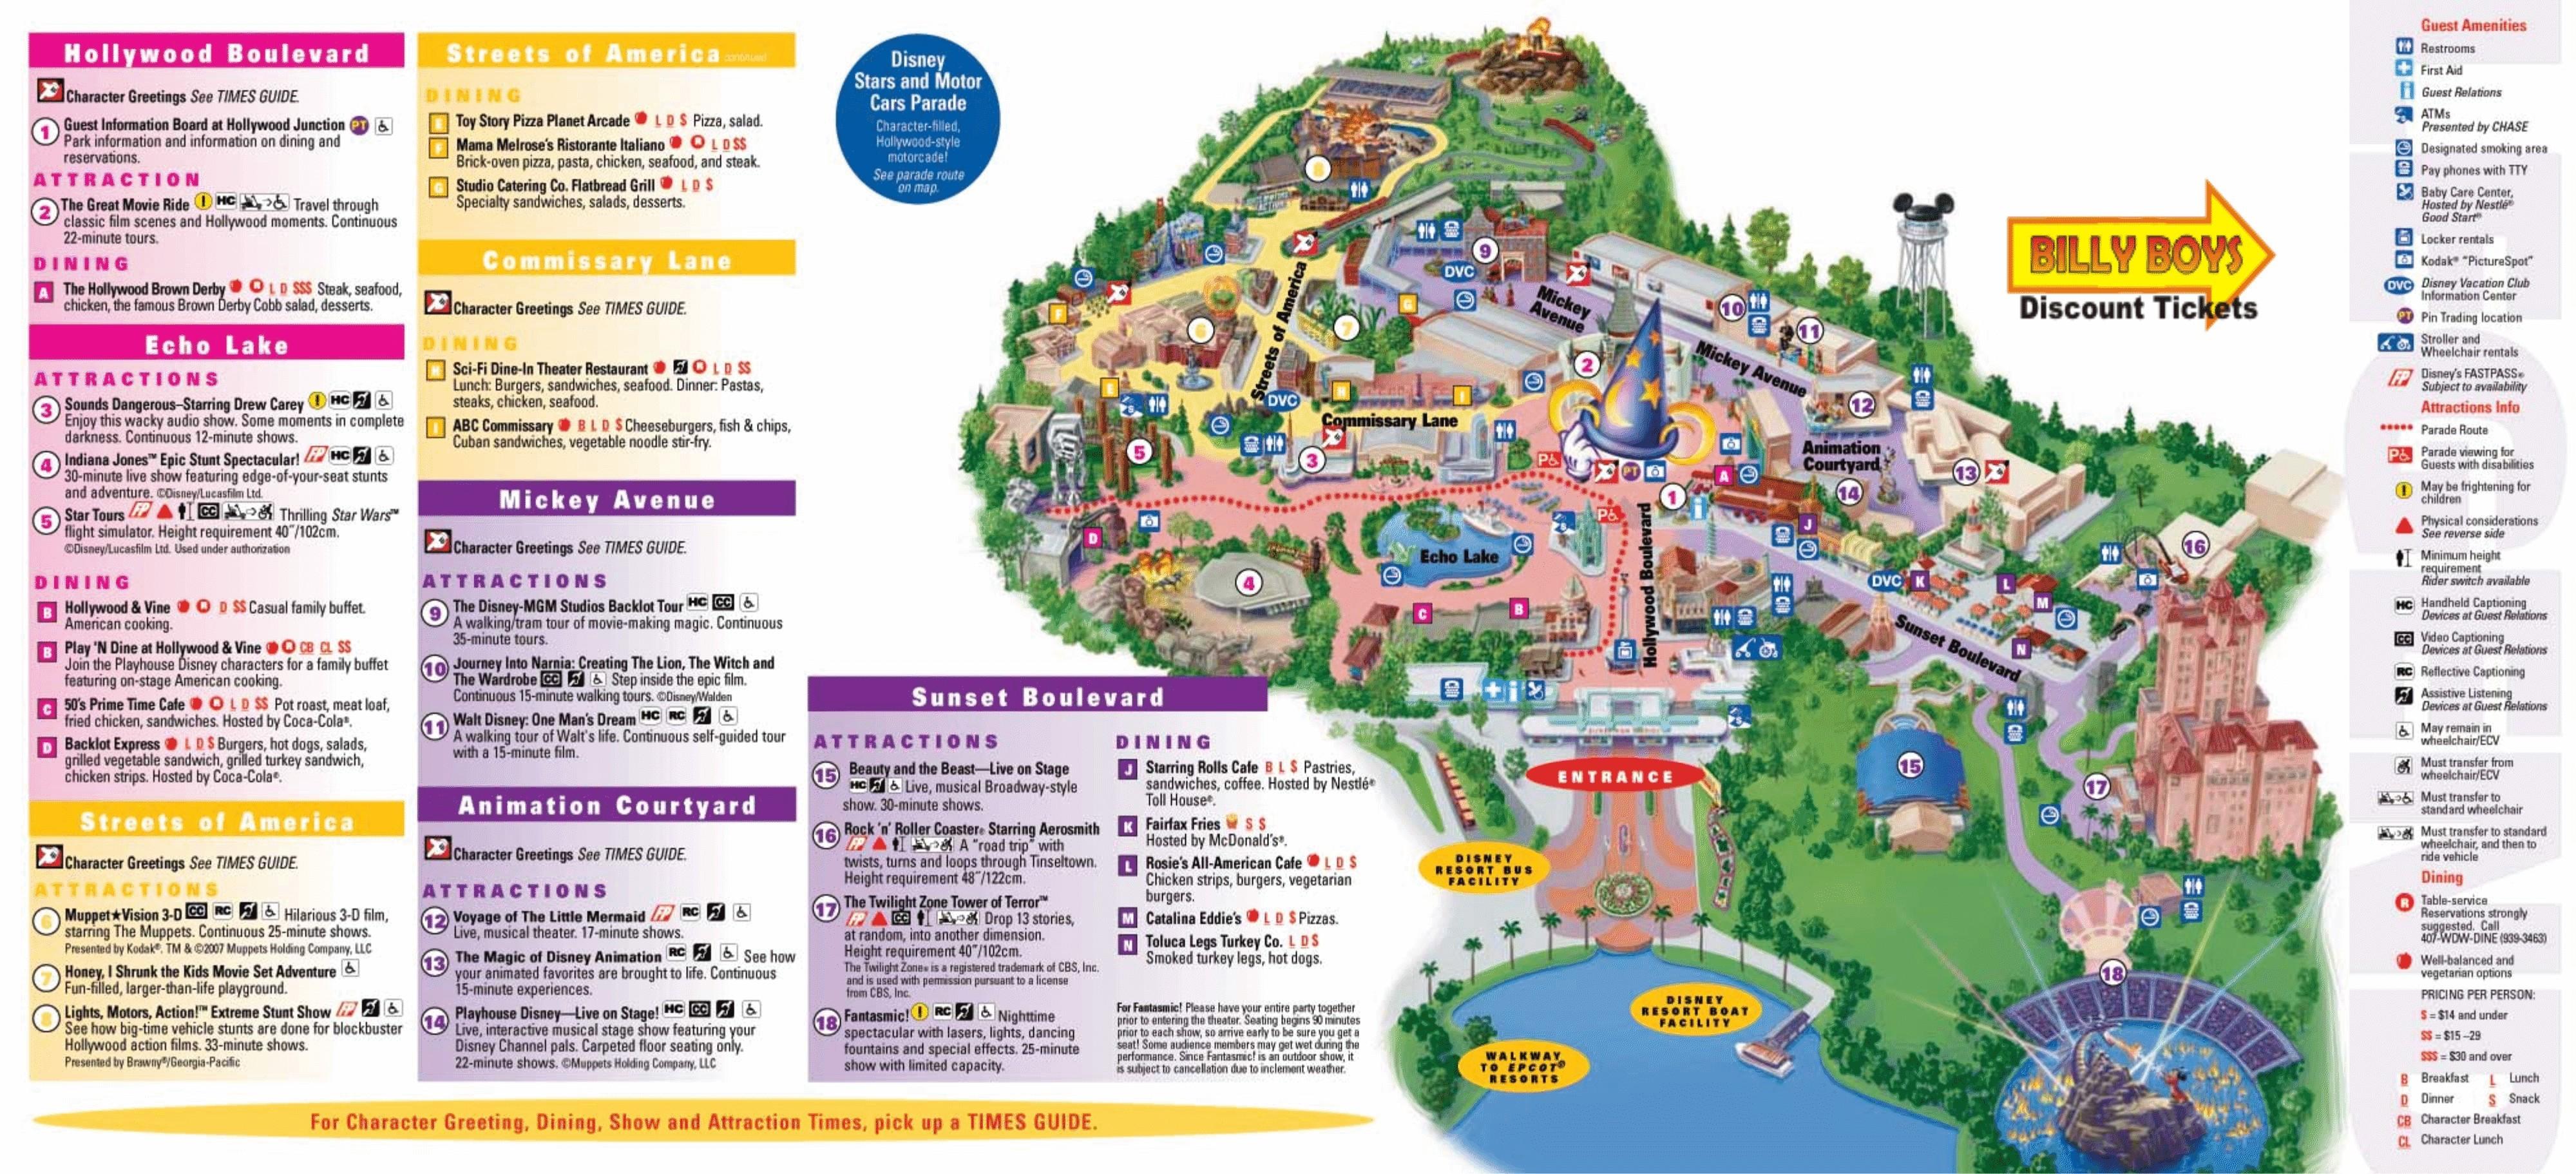 Disney World Orlando Map - World Maps Collection - Google Maps Hollywood Florida